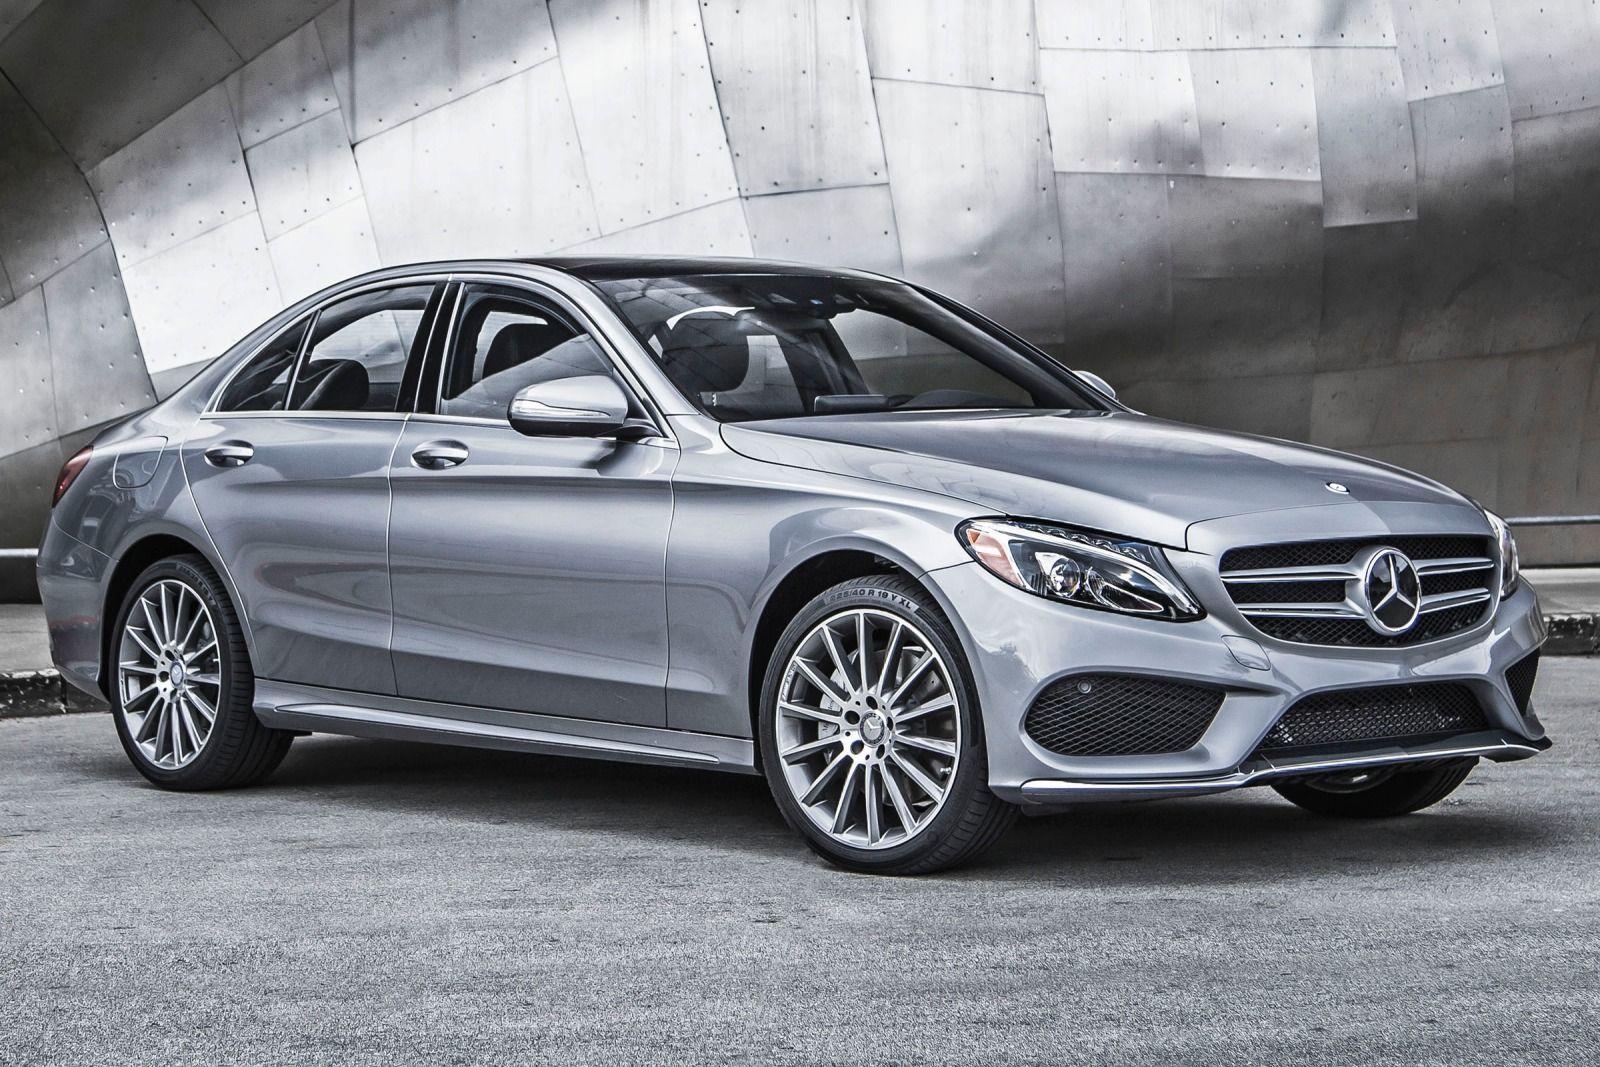 Mercedes benz clase c sed n 2015 moderno elegante for 2015 c300 mercedes benz